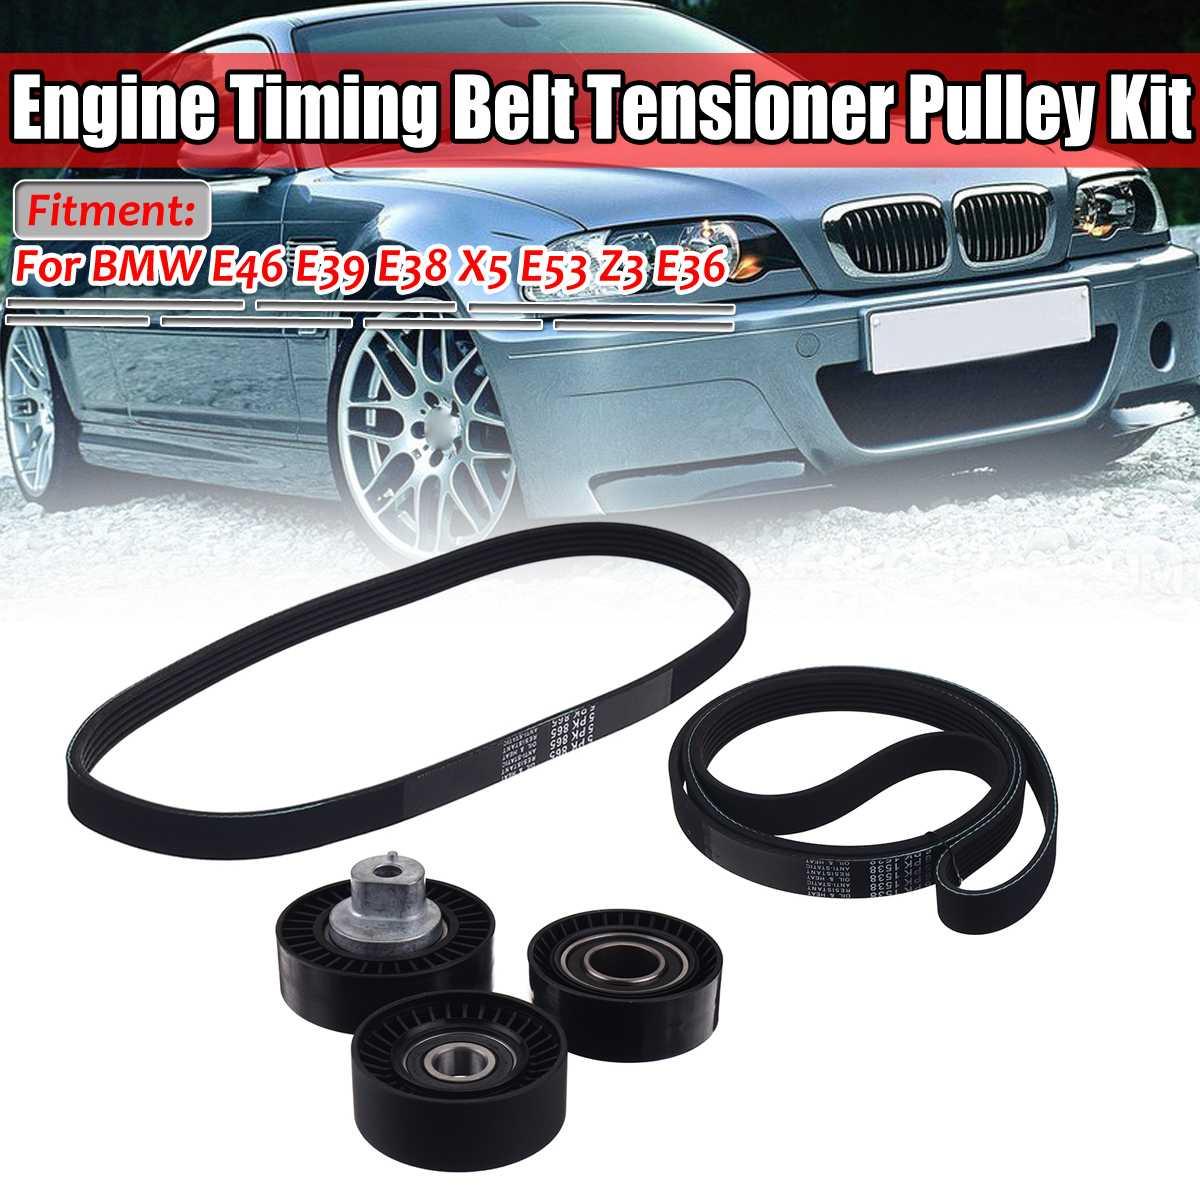 Car Engine Timing Belt Tensioner Pulley Kit ForBMW E46 E39 E38 X5 E53 Z3 E36 11281437475 11281706545